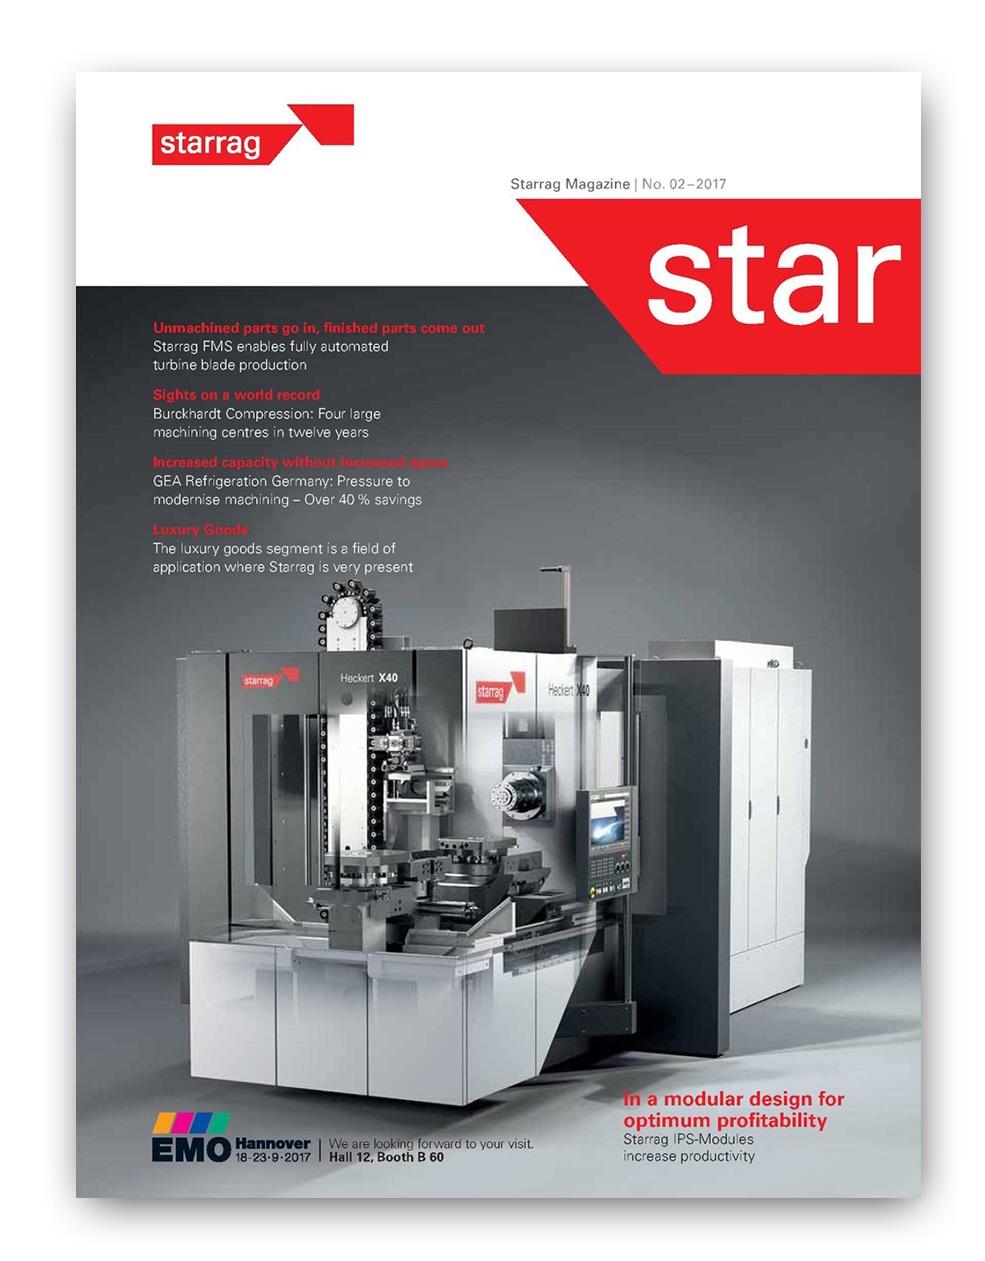 Cover Story: In a modular design for optimum profitability